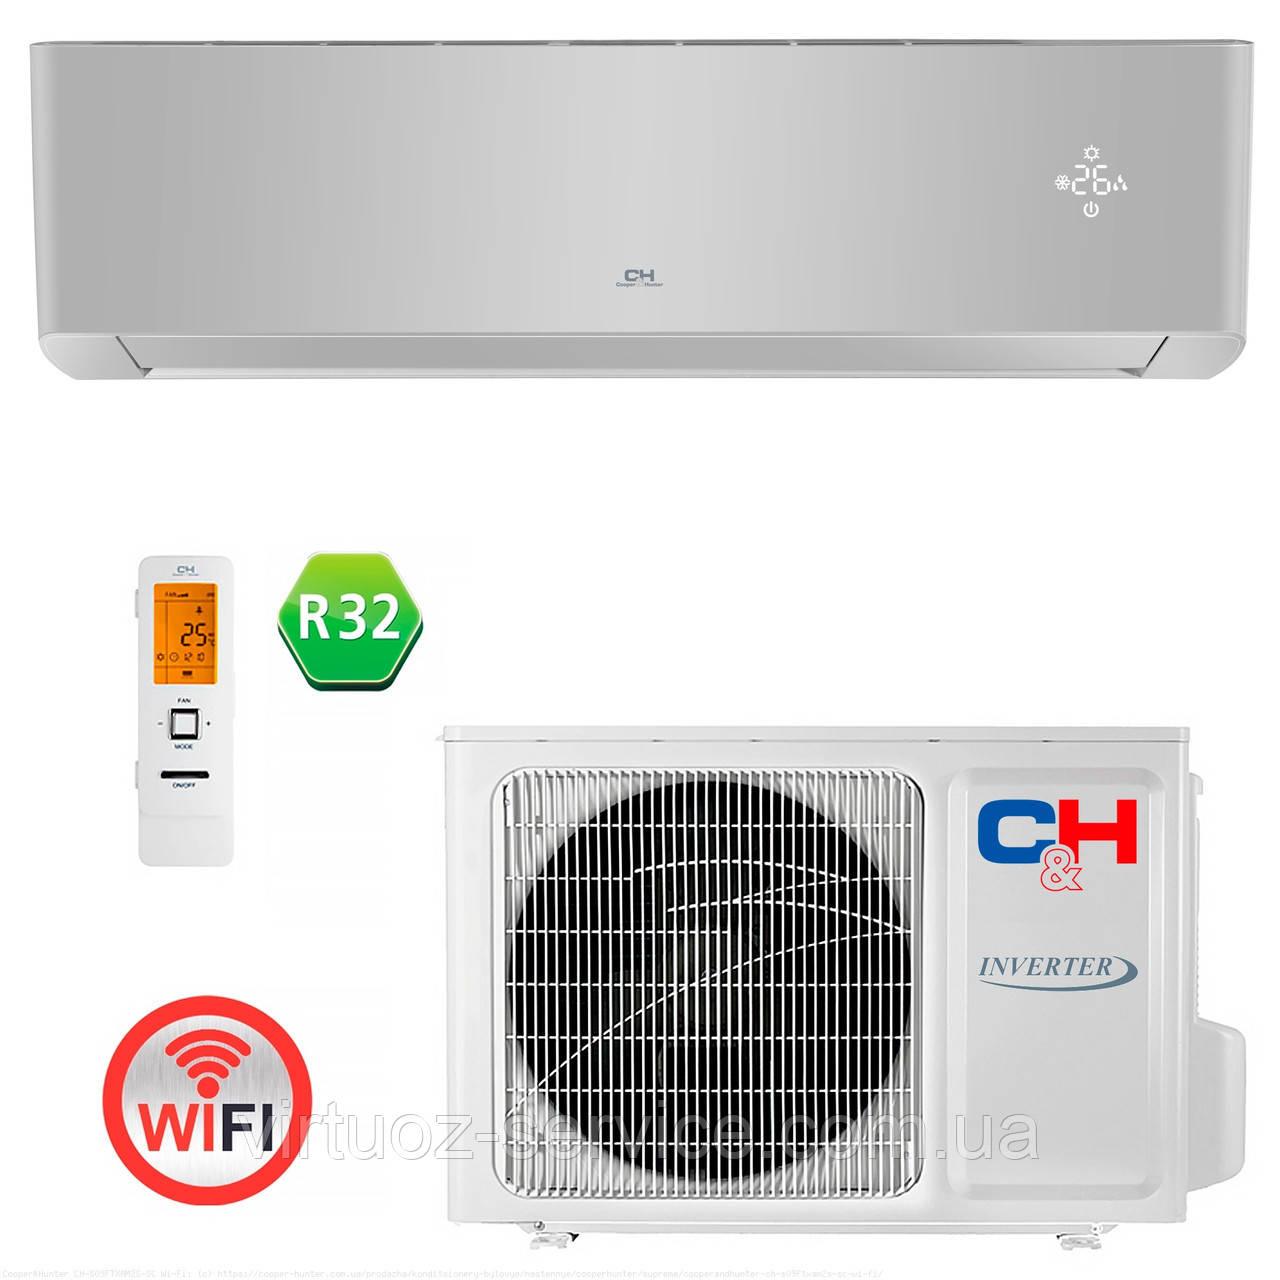 Инверторный кондиционер Cooper&Hunter CH-S12FTXAM2S-WP Wi-Fi